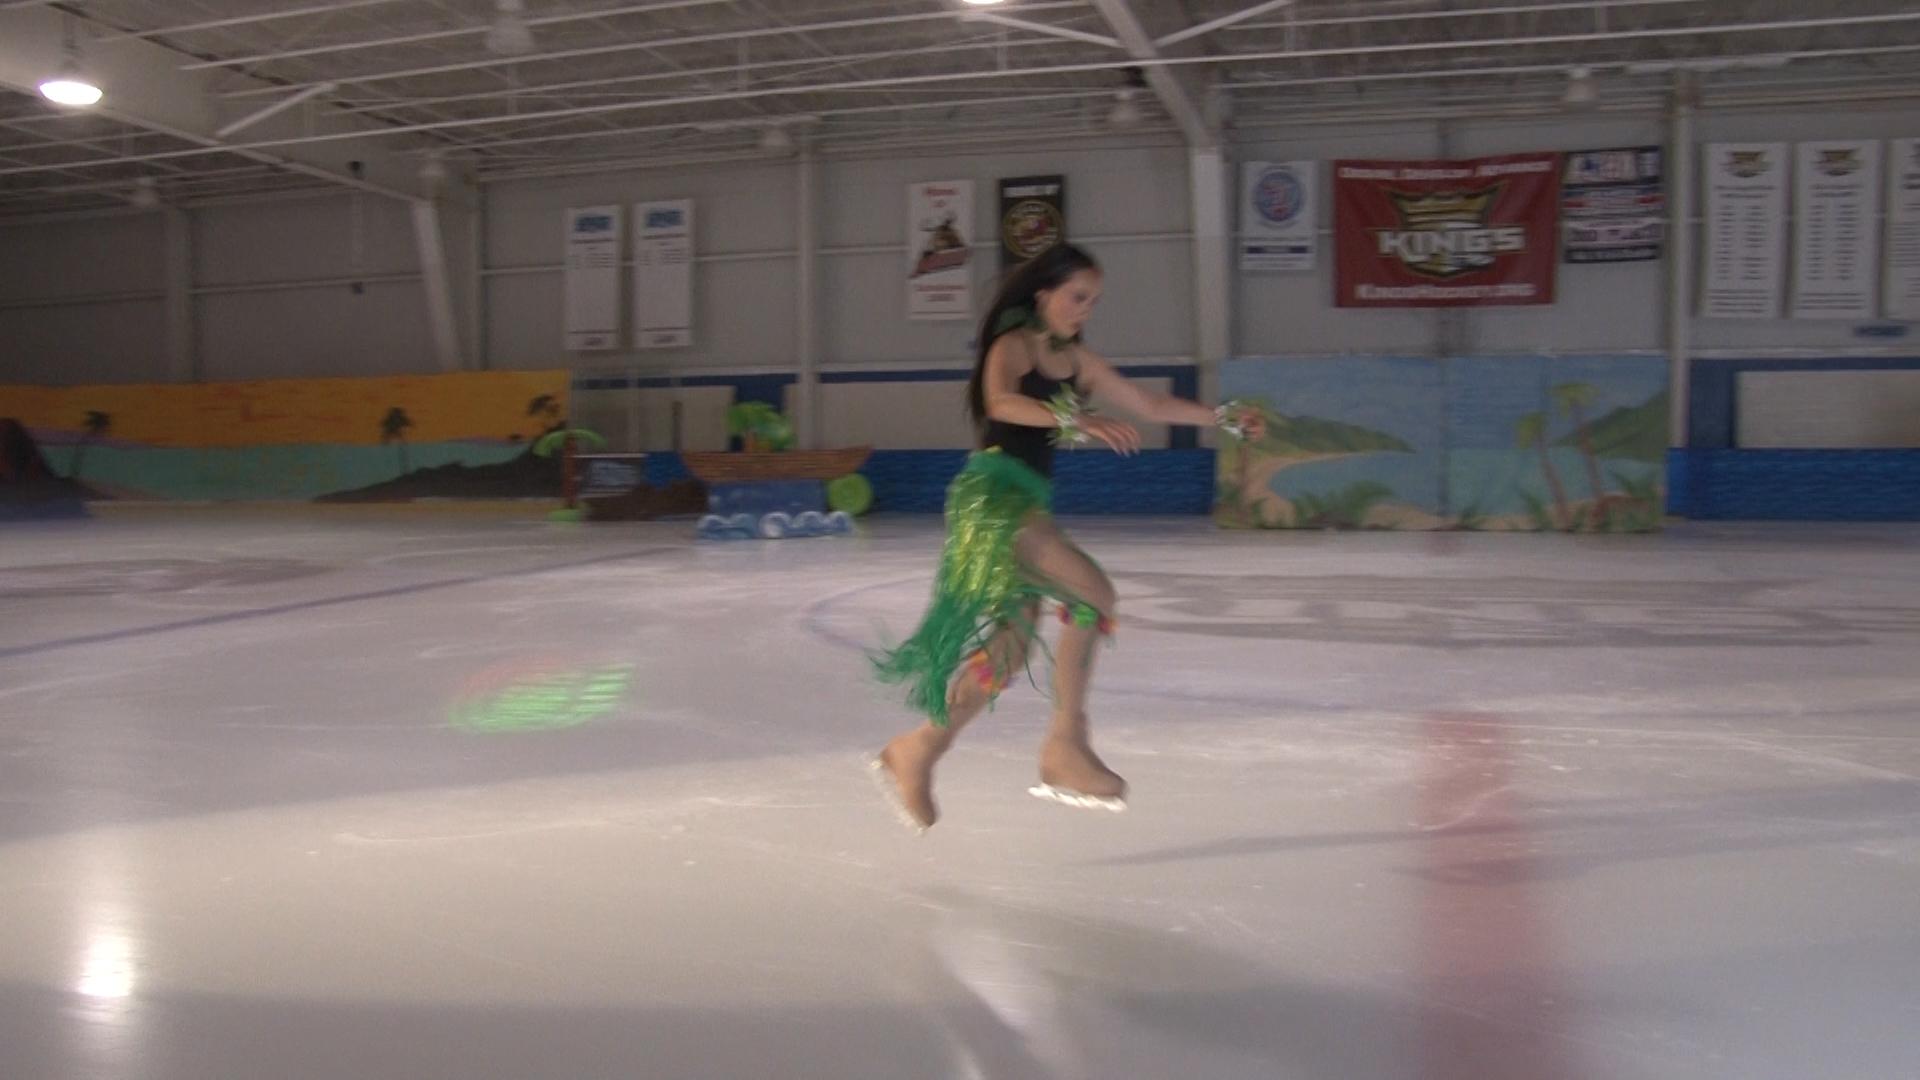 Power Play Maui Skate on Ice 071417.00_09_09_25.Still015.jpg